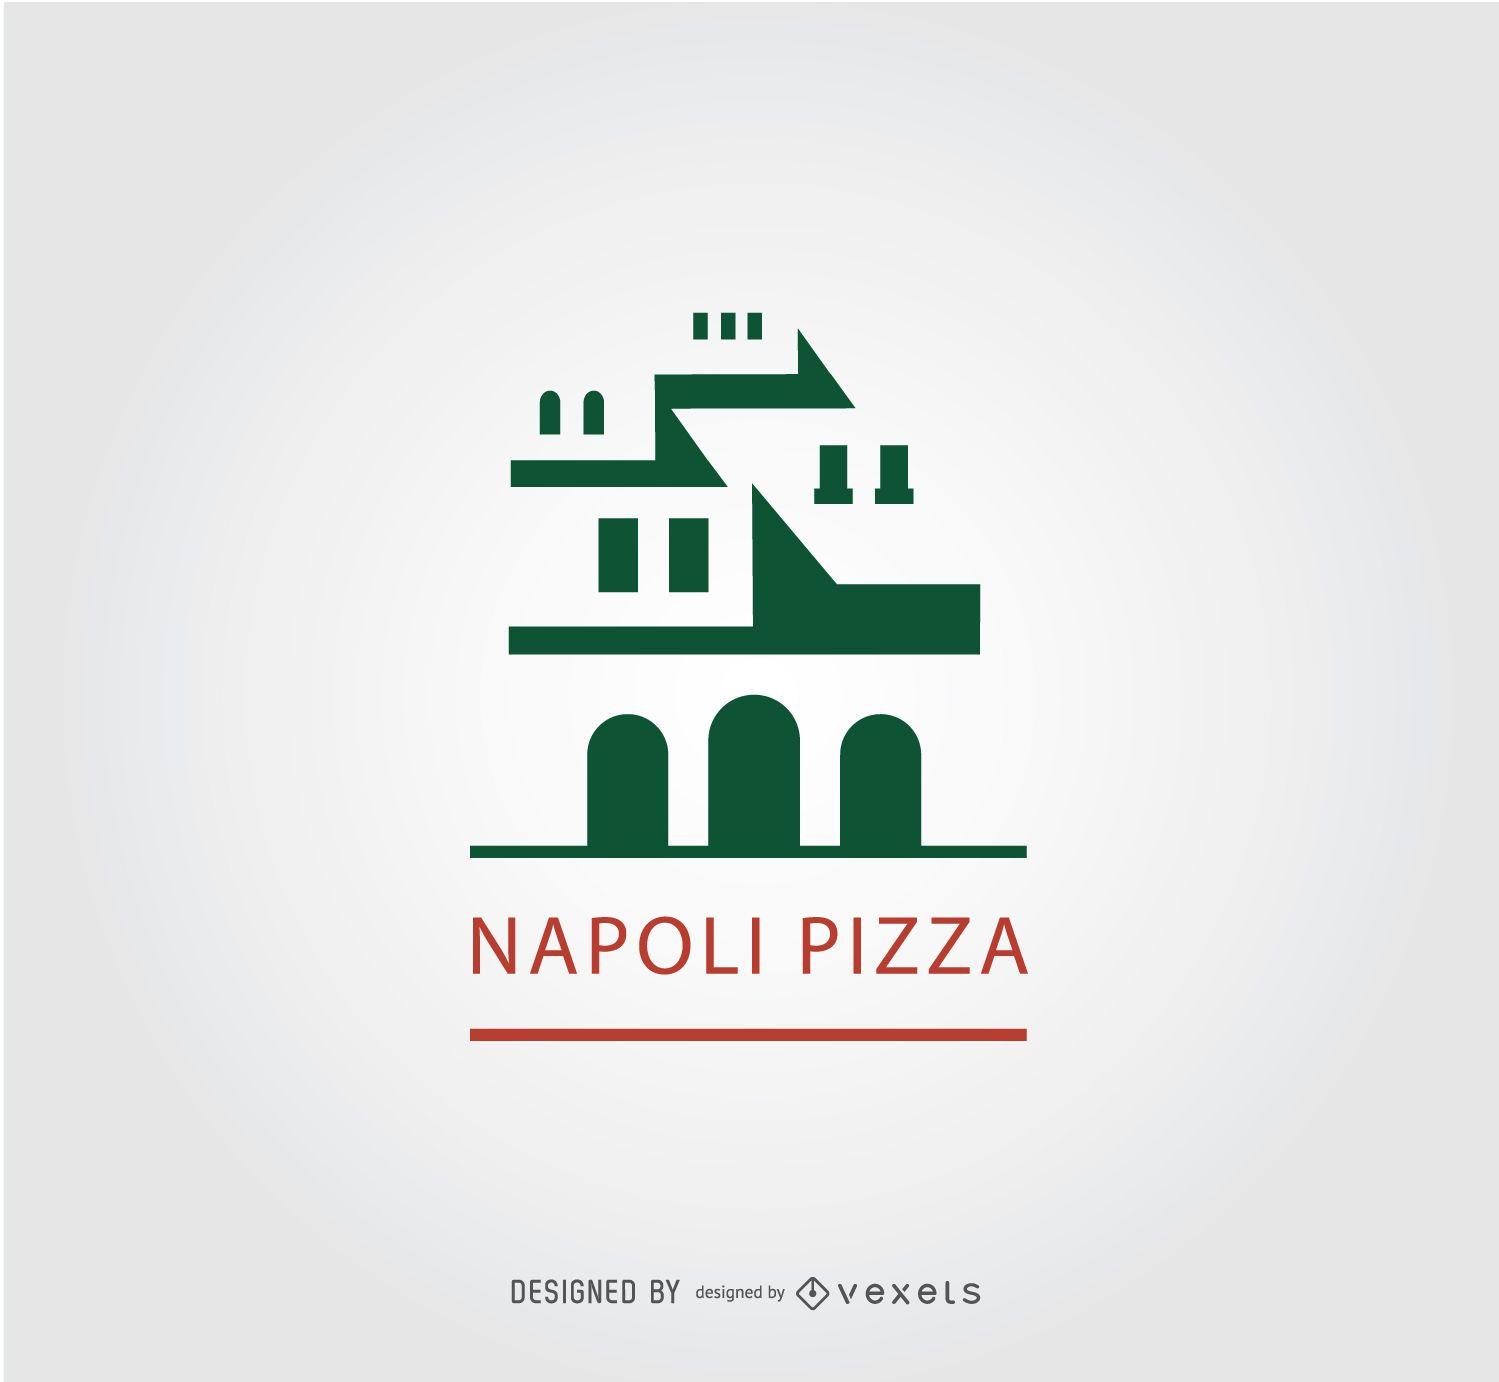 Logotipo de pizza de edificio antiguo Napoli